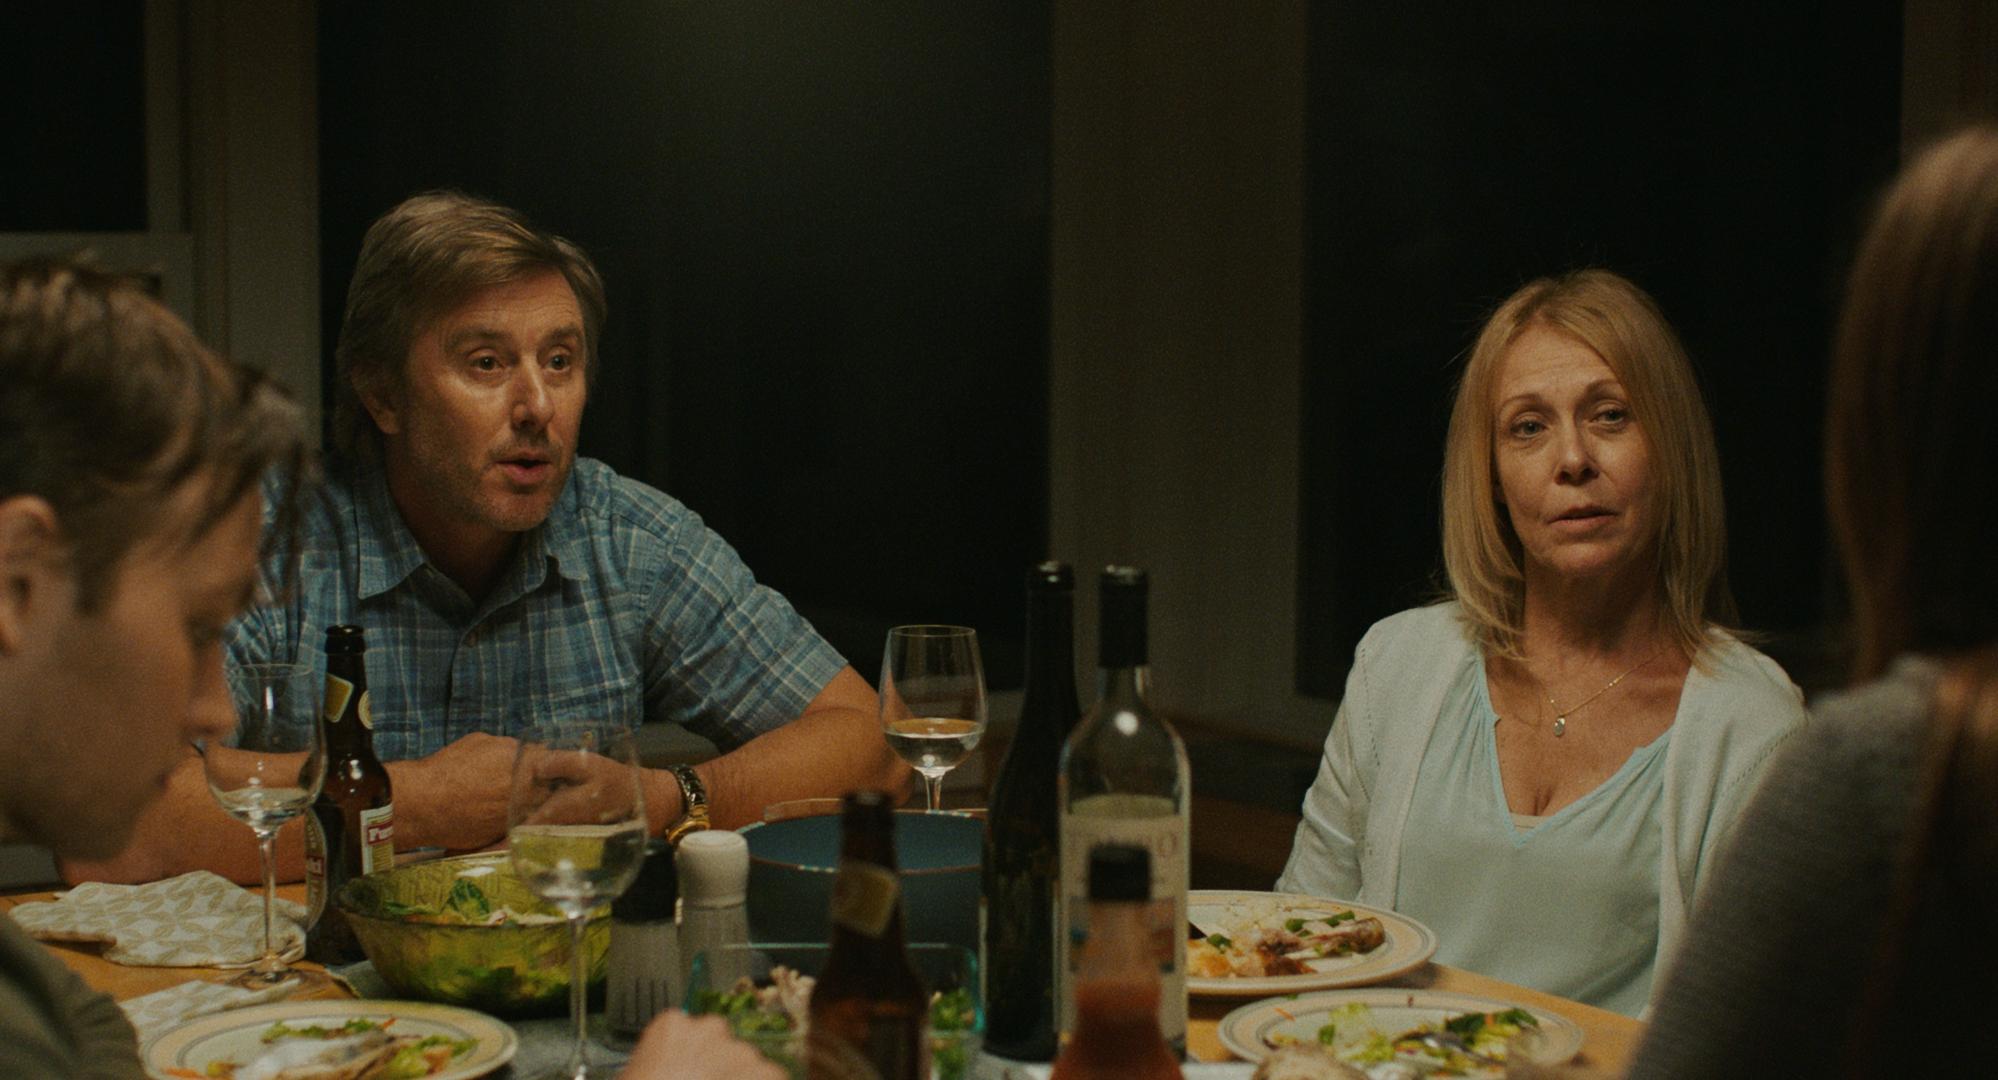 Film Still from The Beach House (2019)